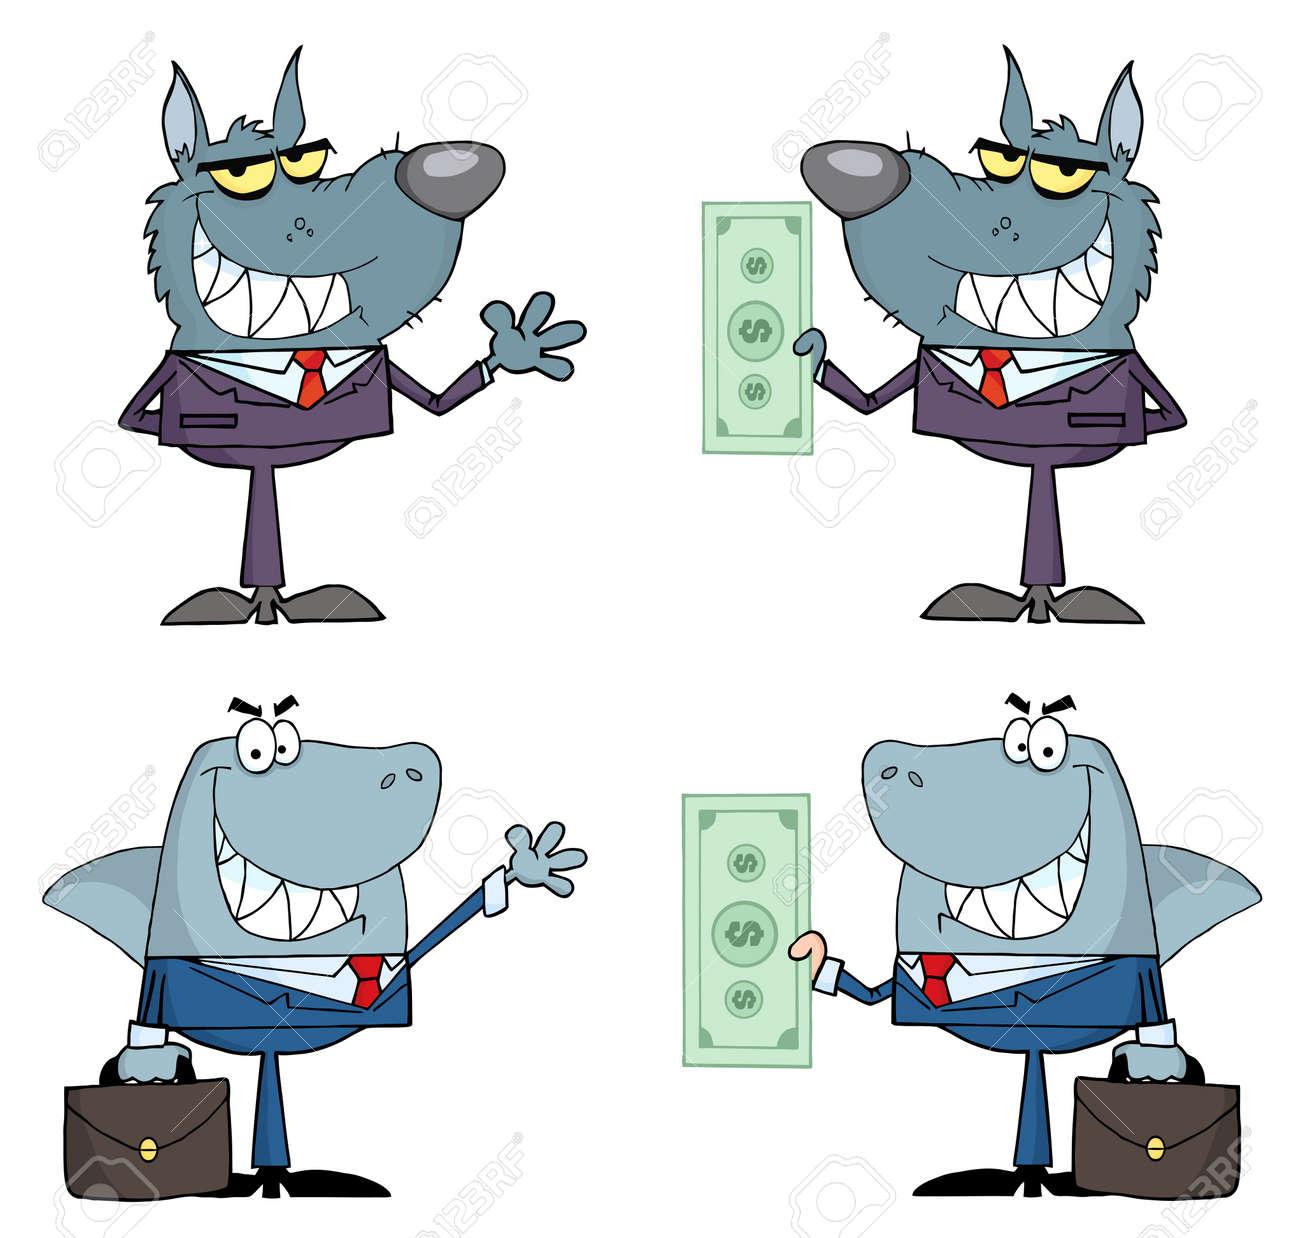 Business team cartoon characters cartoon vector cartoondealer com - Animals Businessmen Cartoon Characters Raster Collection Stock Vector 9789358